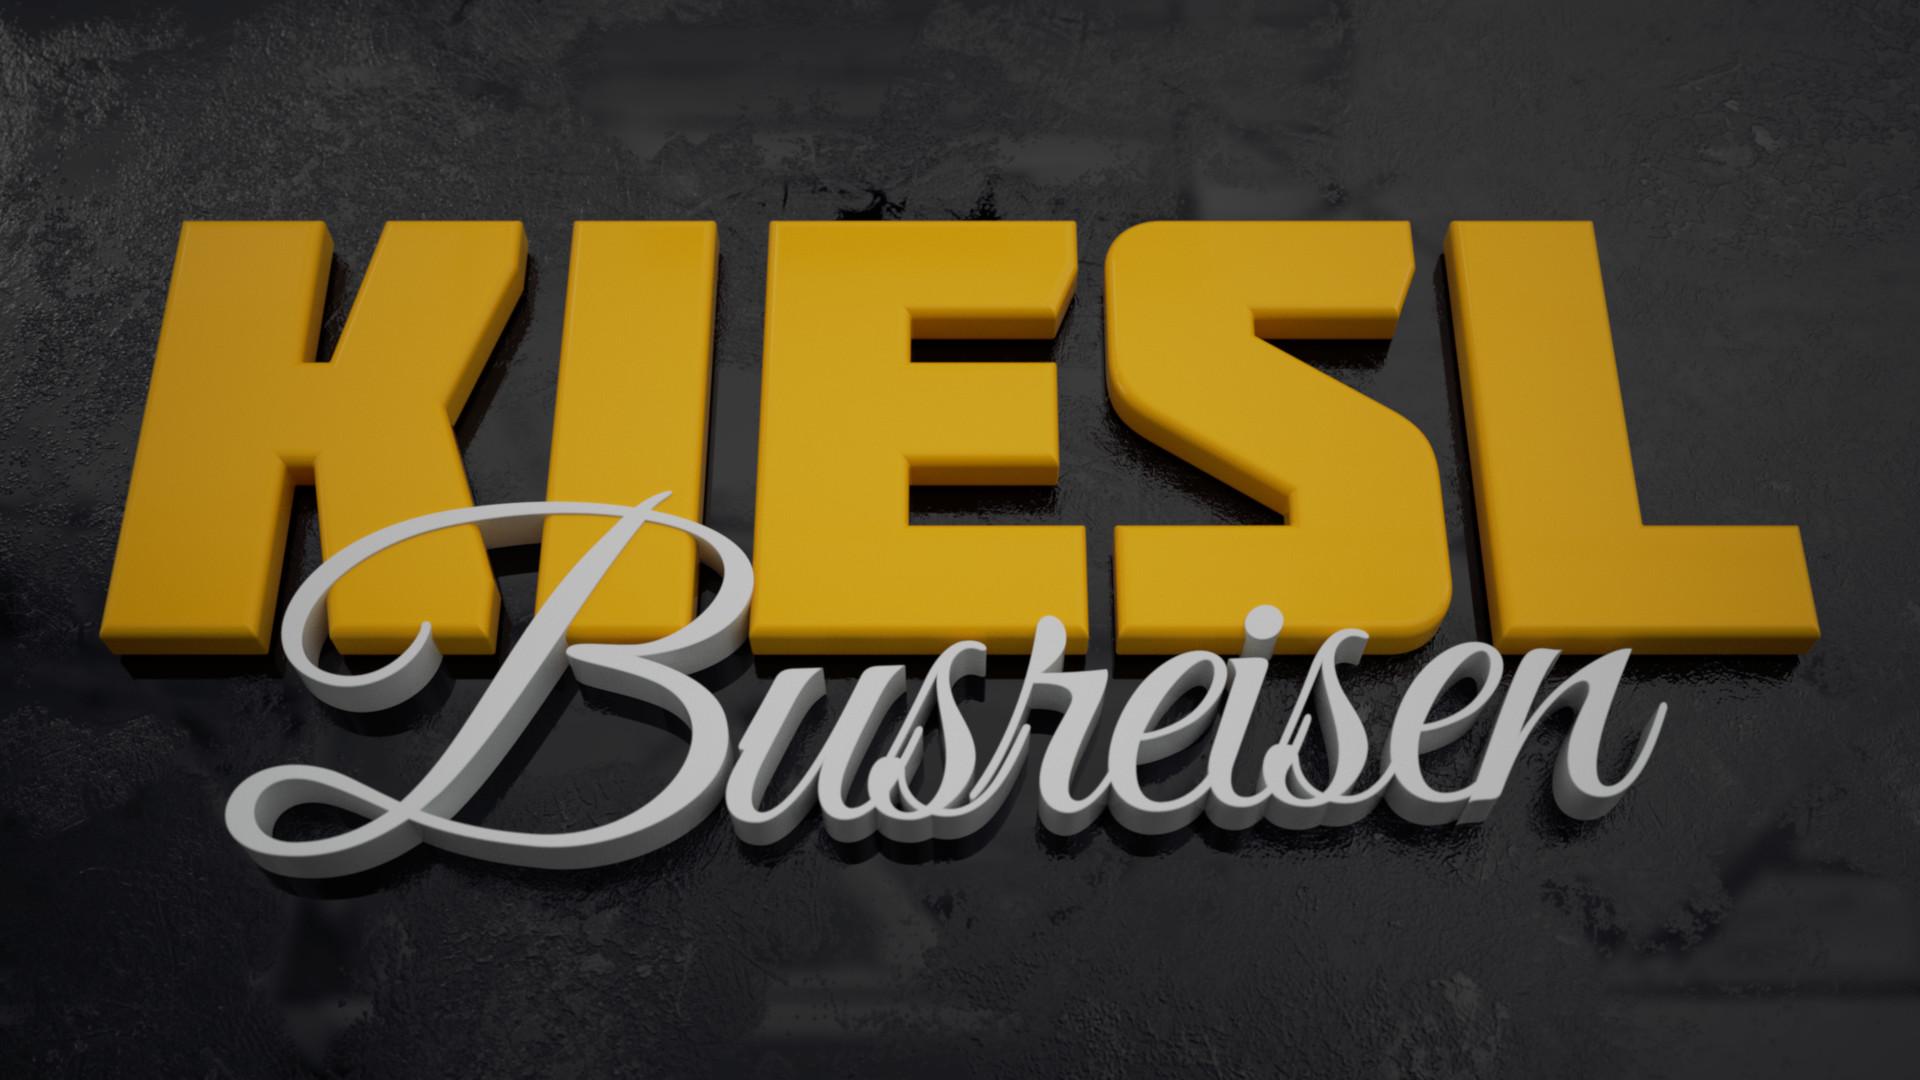 Reinhard kepplinger kiesl logo v4 arion test sl 11 19 min aa2 pixrad 08 gi8 yellow kiesl carpaint cam1 new back16k